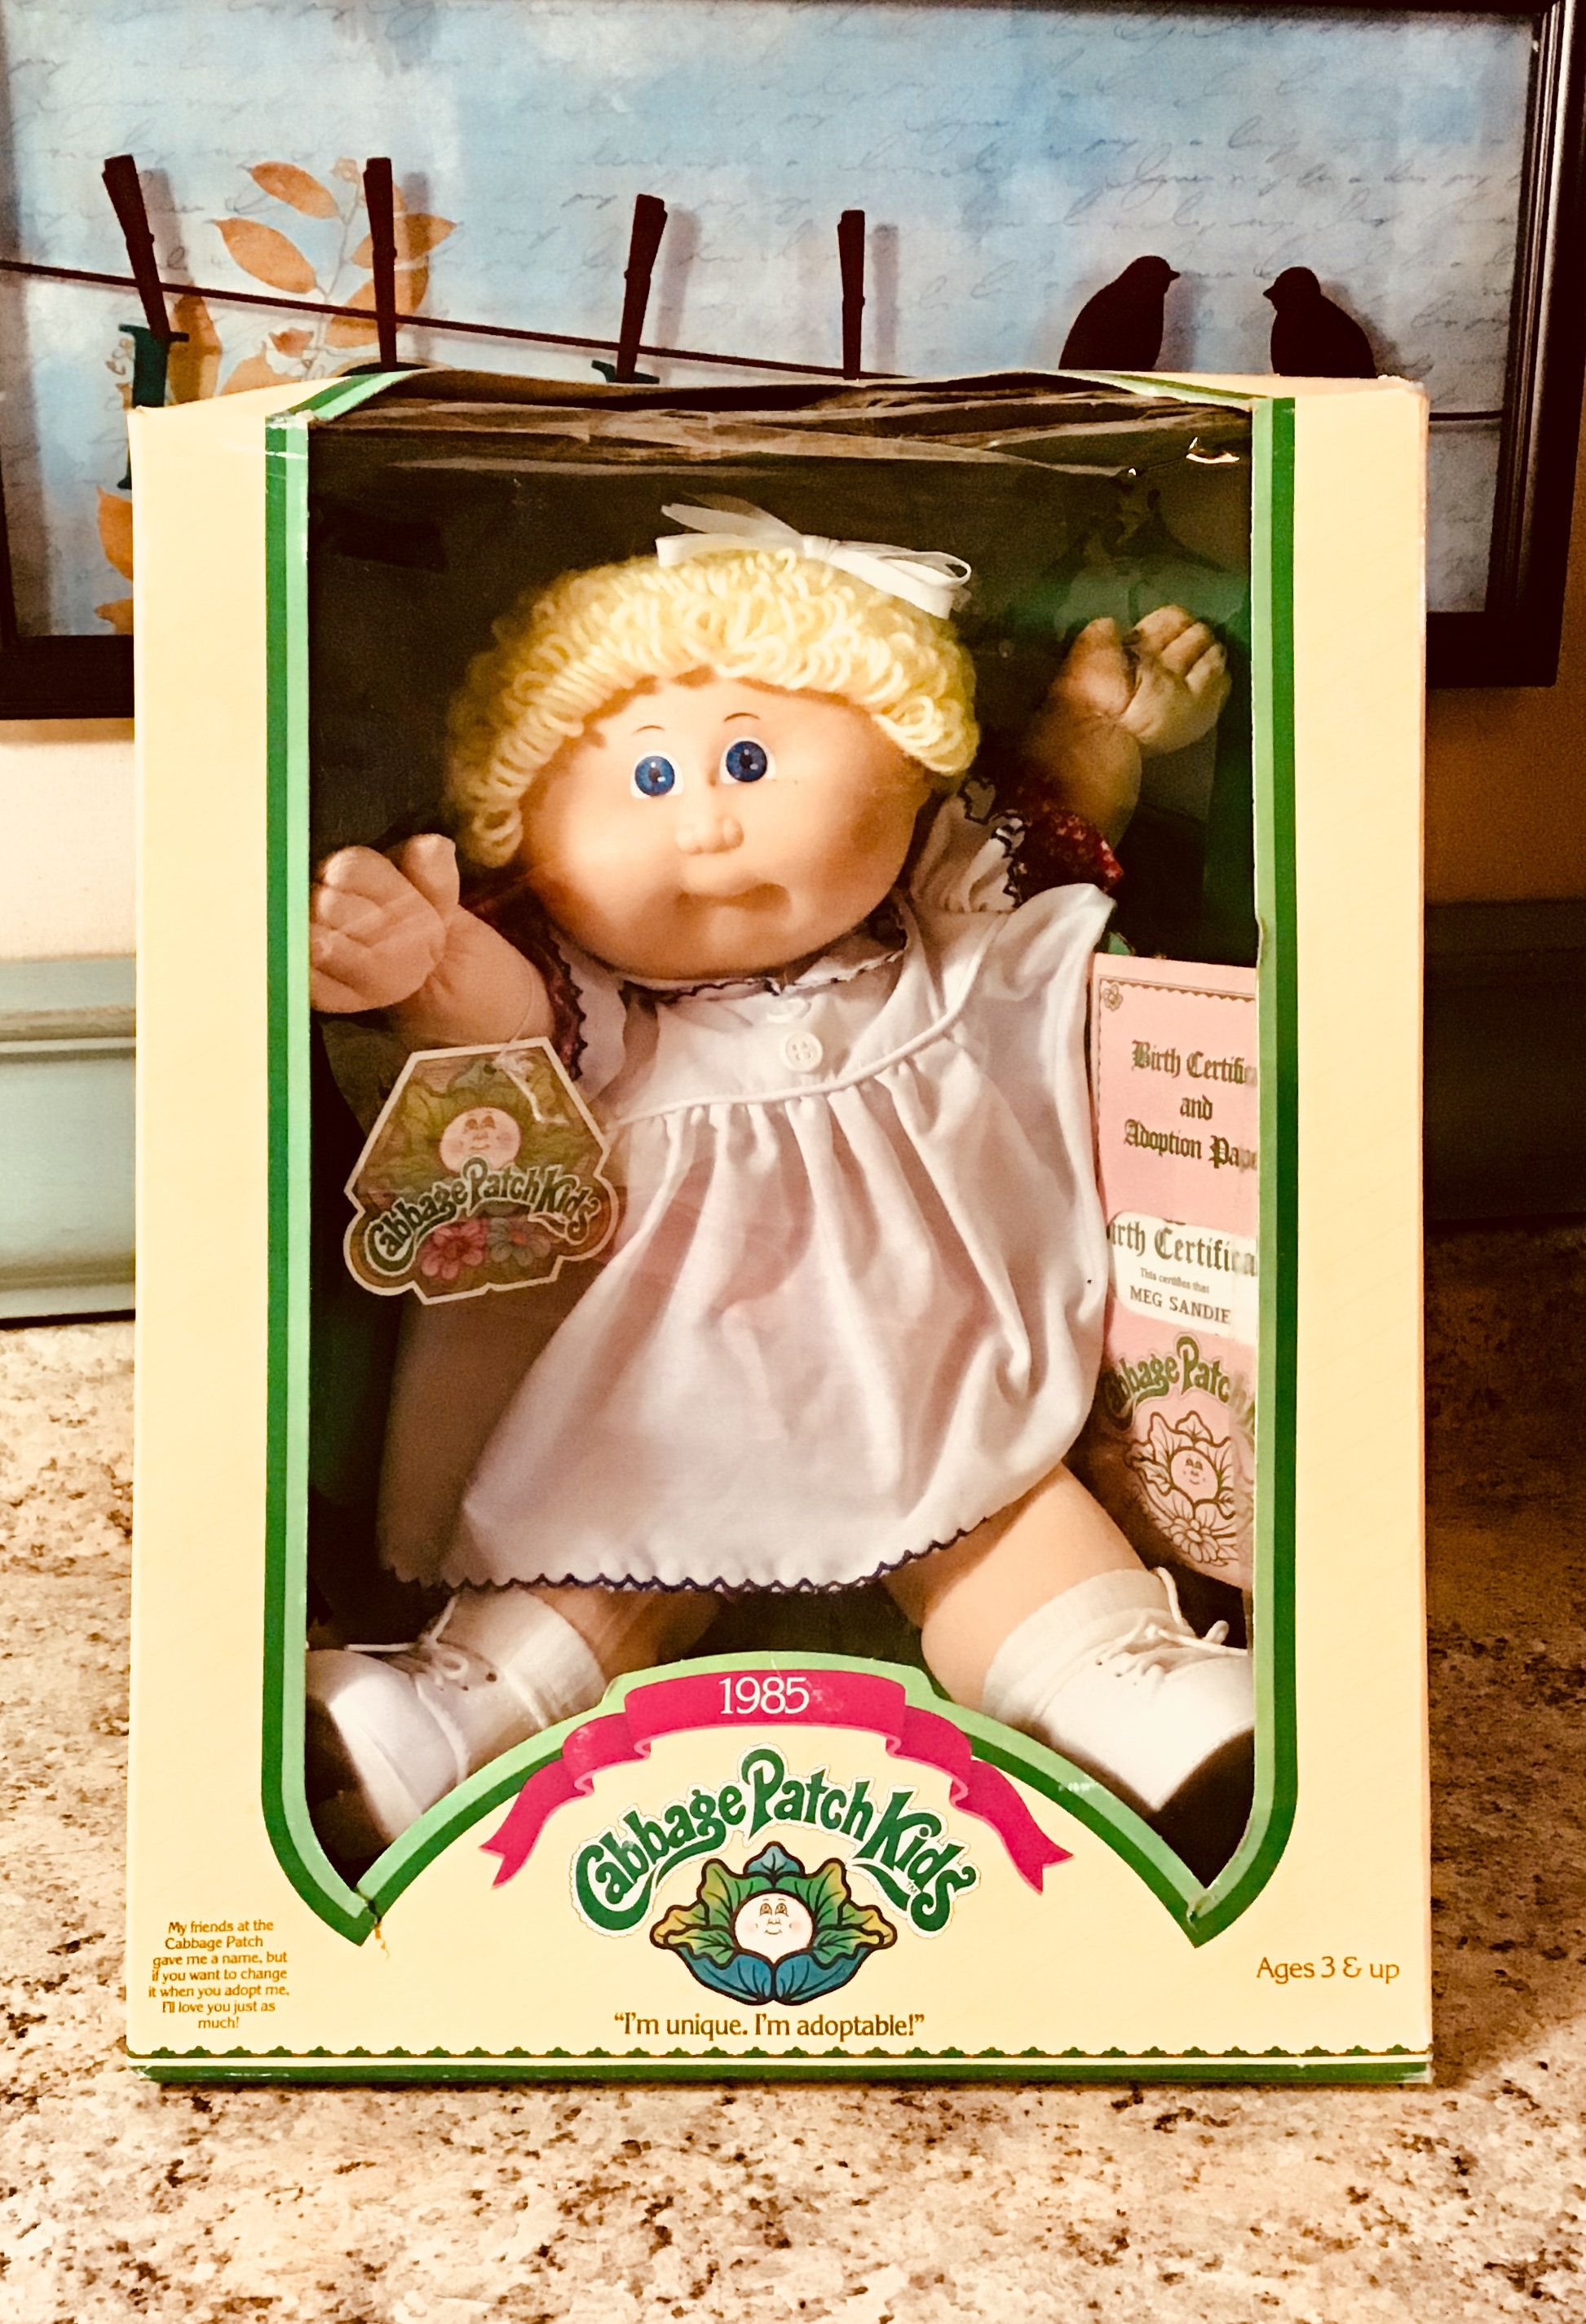 1985 Nib Cabbage Patch Kid Xavier Roberts Cbk Doll Etsy Cabbage Patch Kids Toy Collection Cabbage Patch Dolls